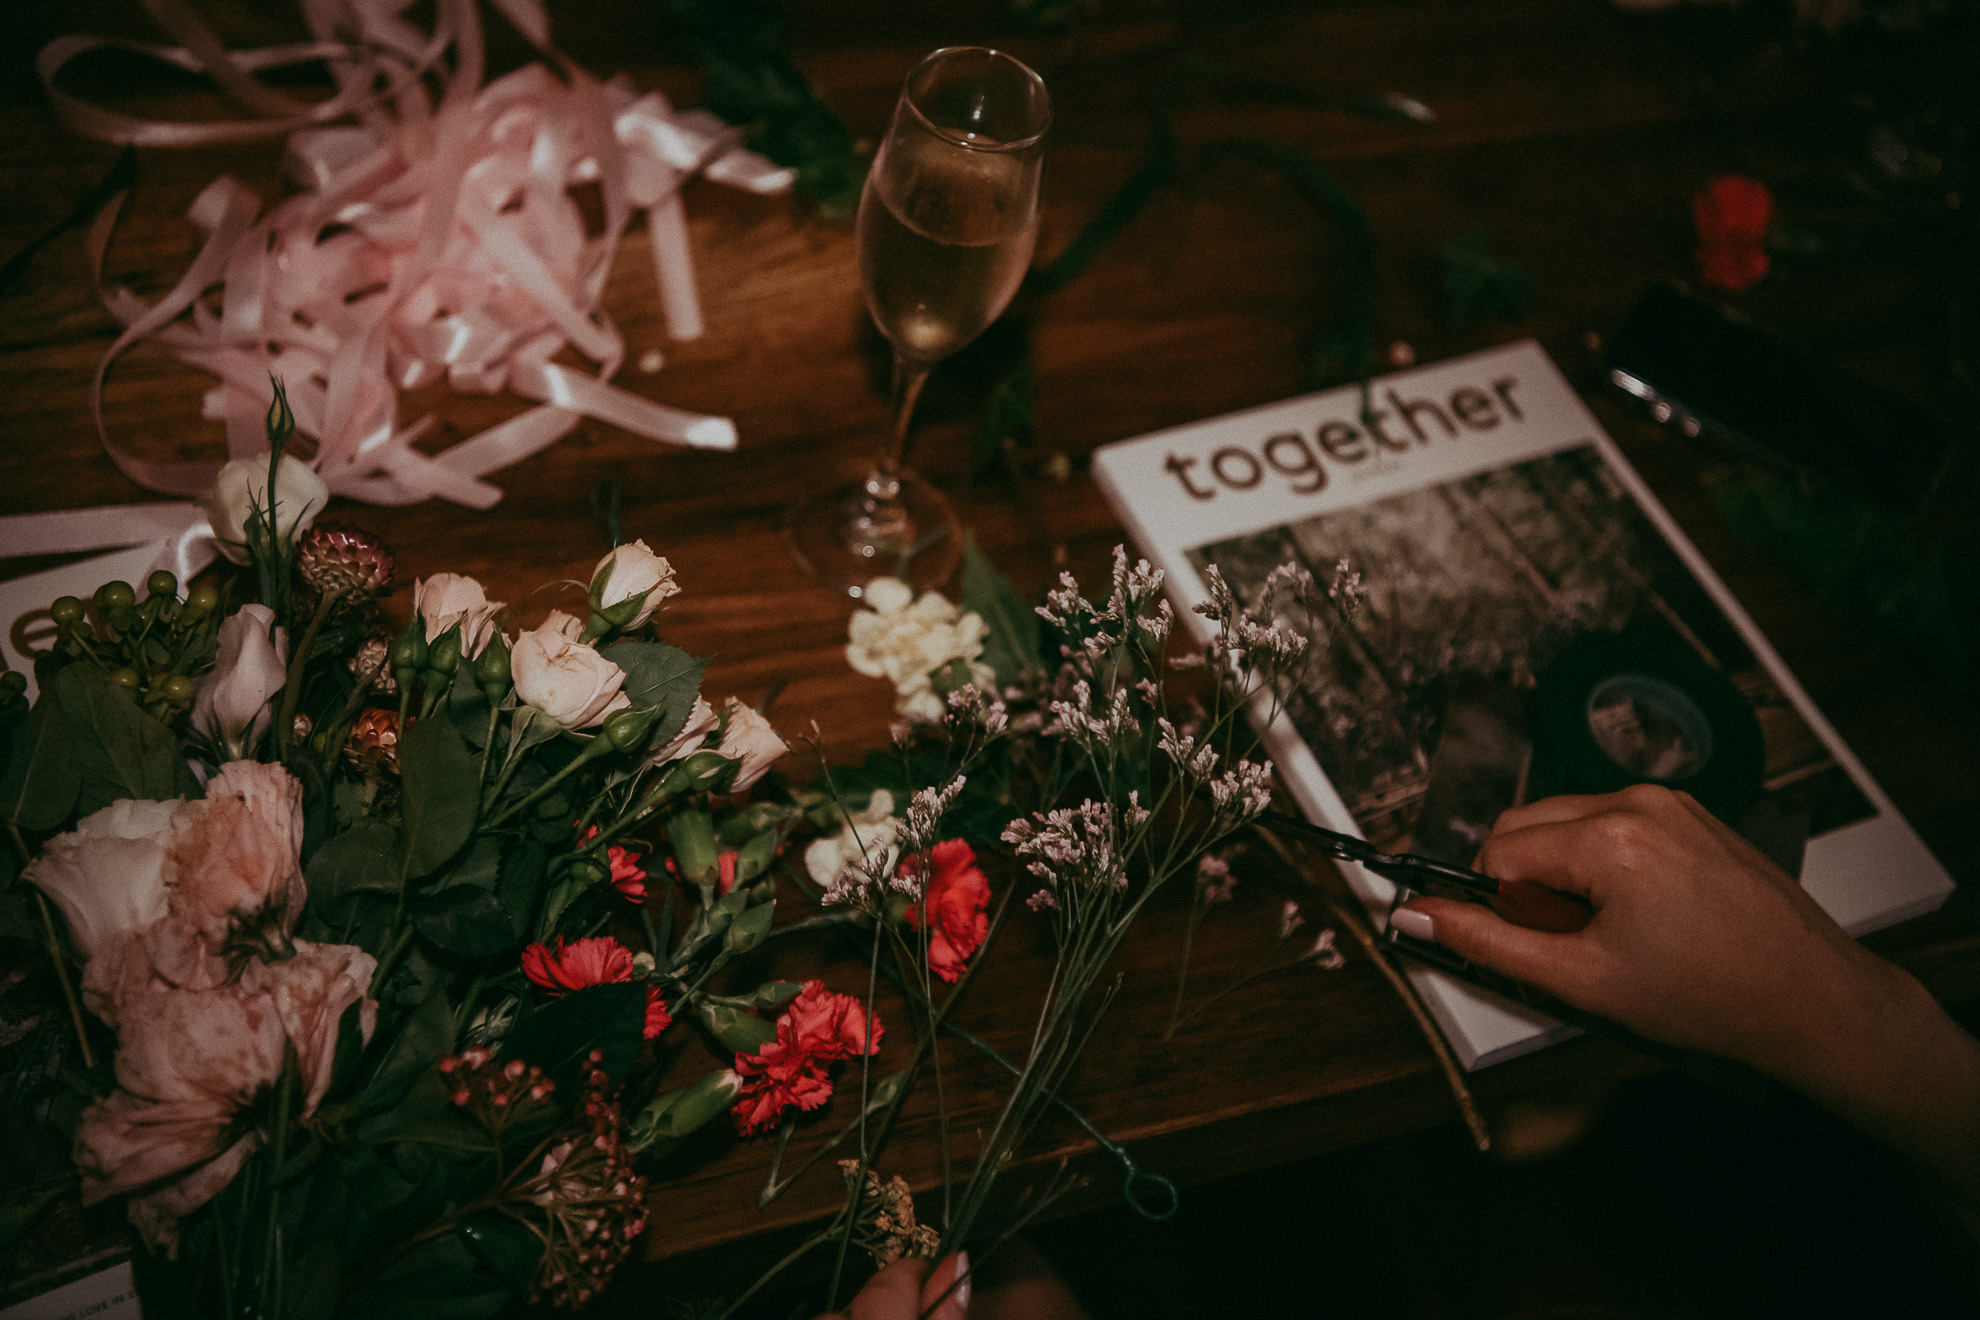 flower-workshop-by-olgalevien-24.jpg